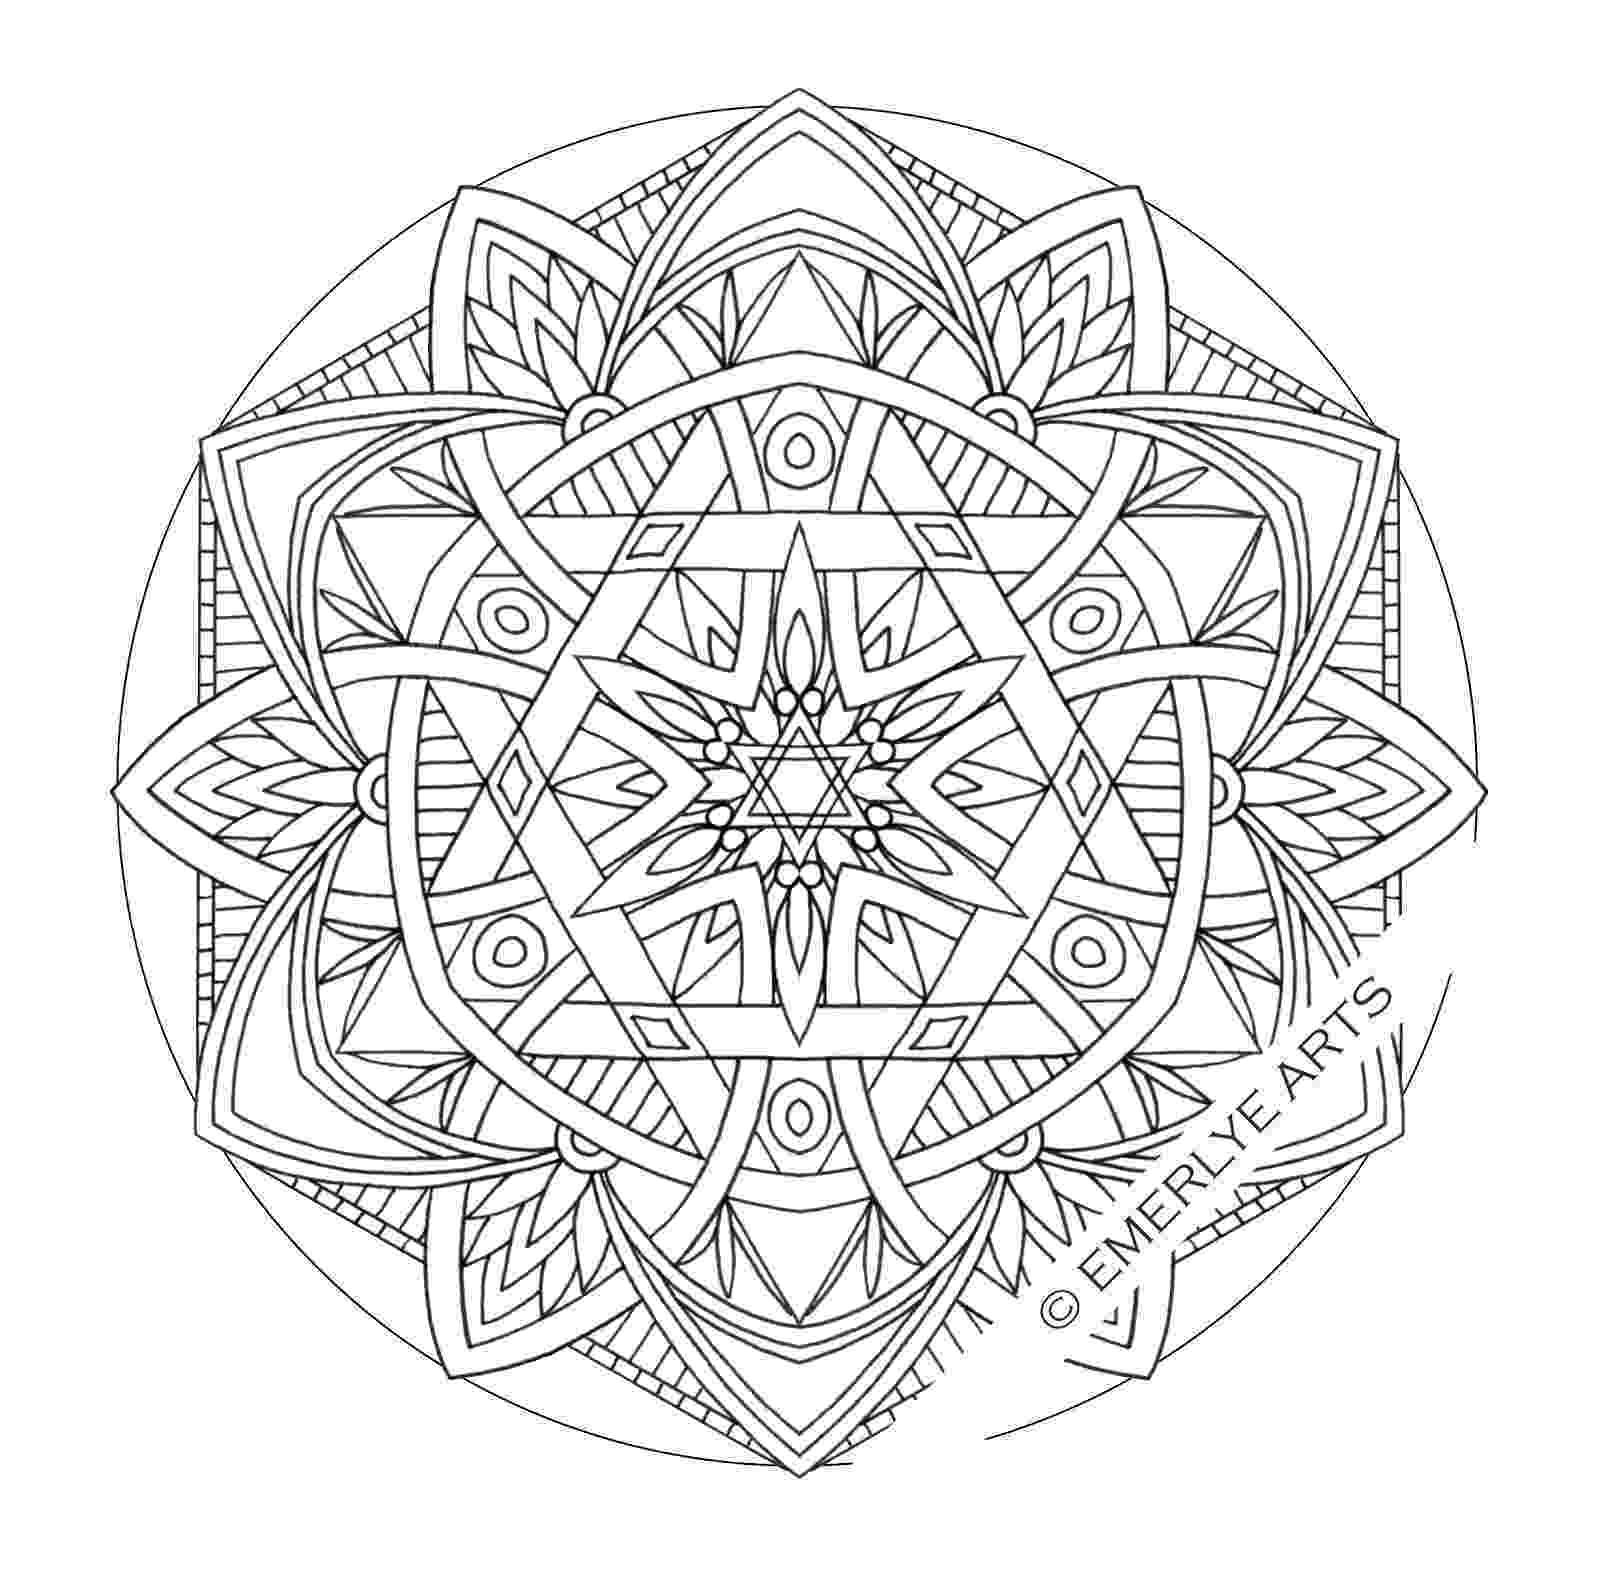 mandala to color flower mandala coloring page free printable coloring pages to mandala color